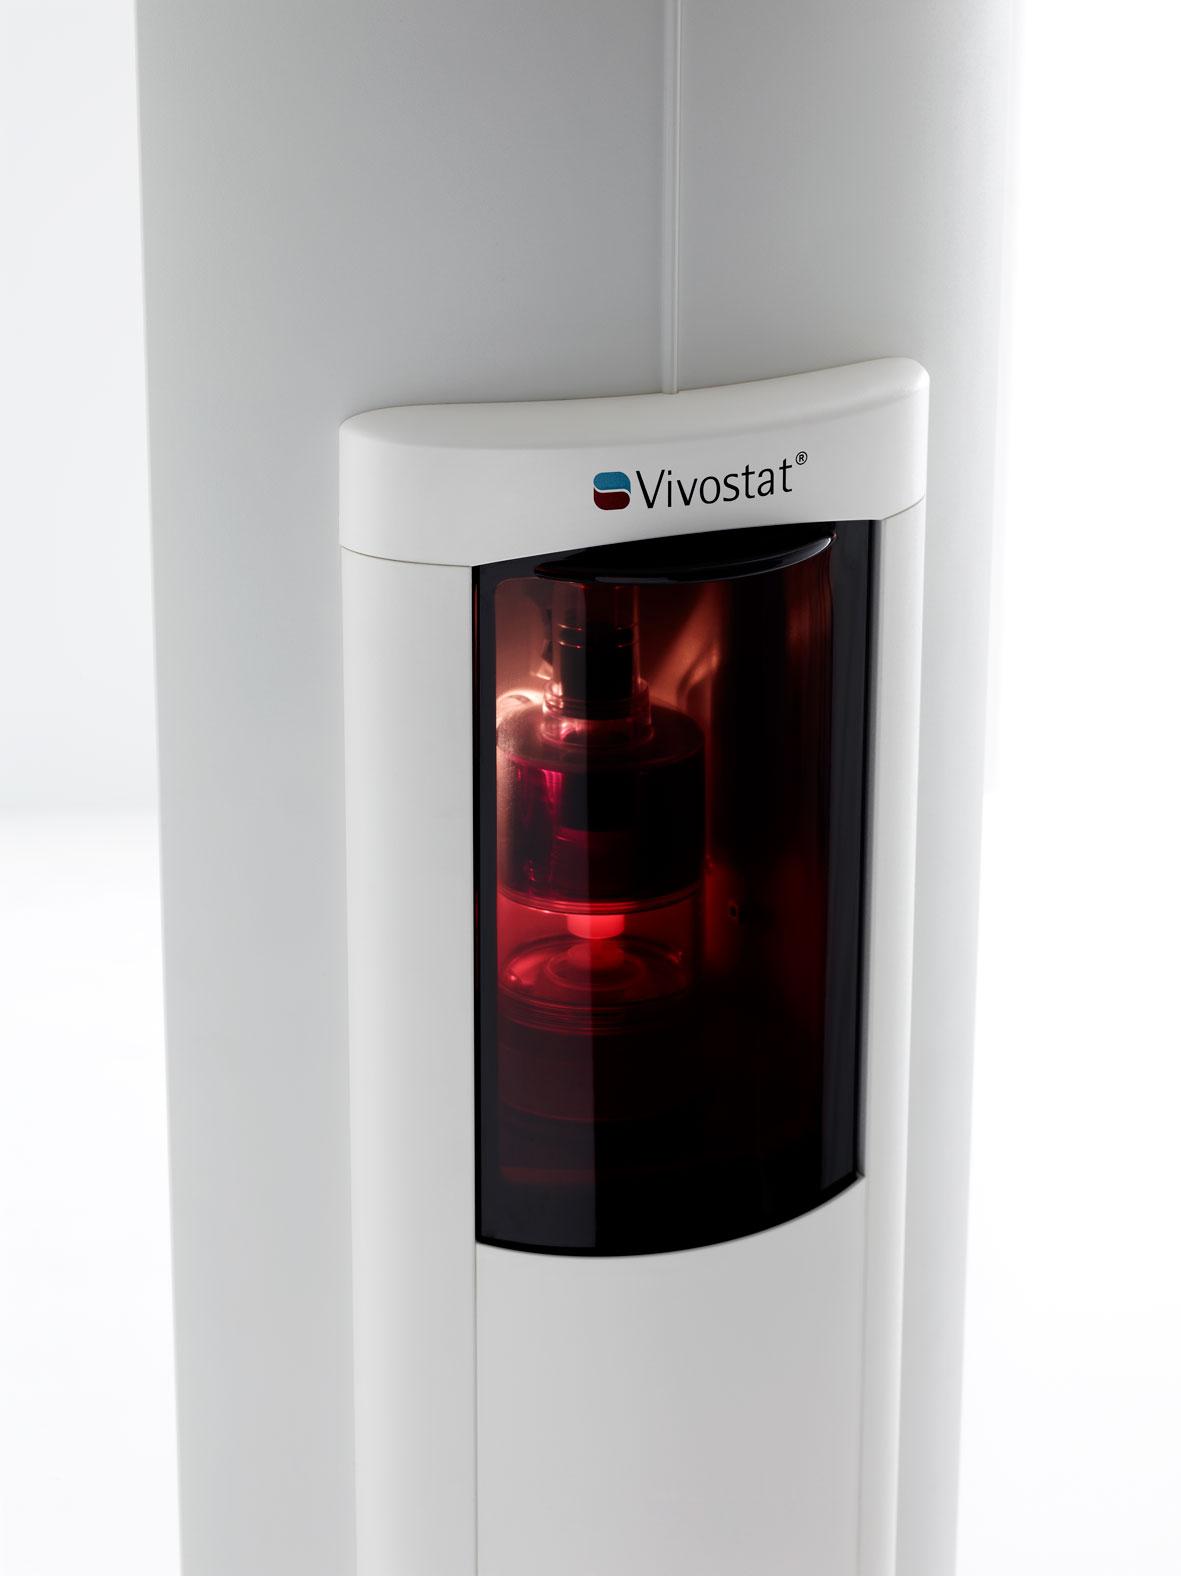 Vivostat Processor 800